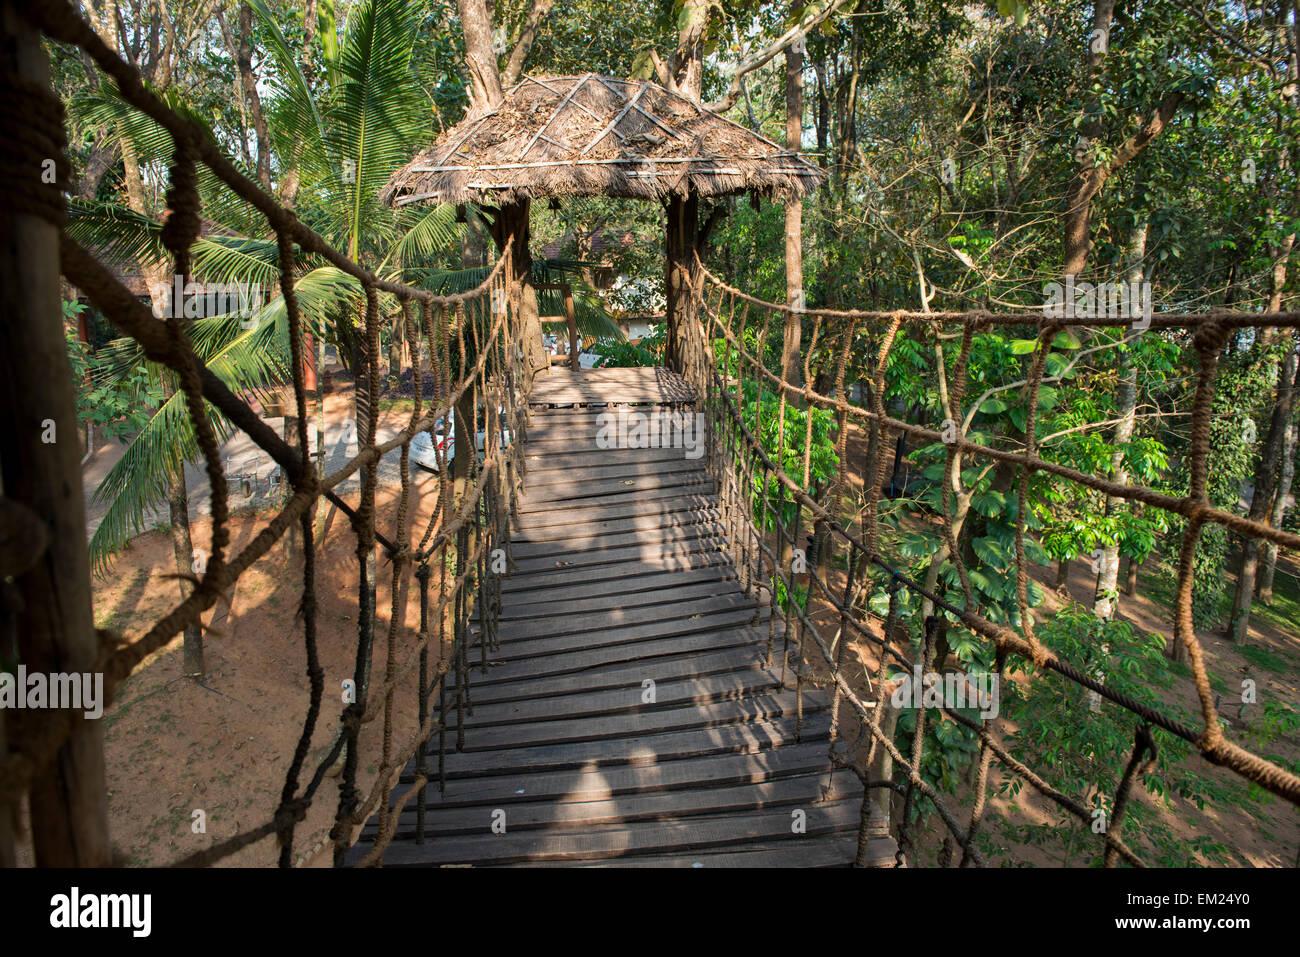 Treetop coffee shop at Greenwoods Resort in Kumily, Kerala India - Stock Image